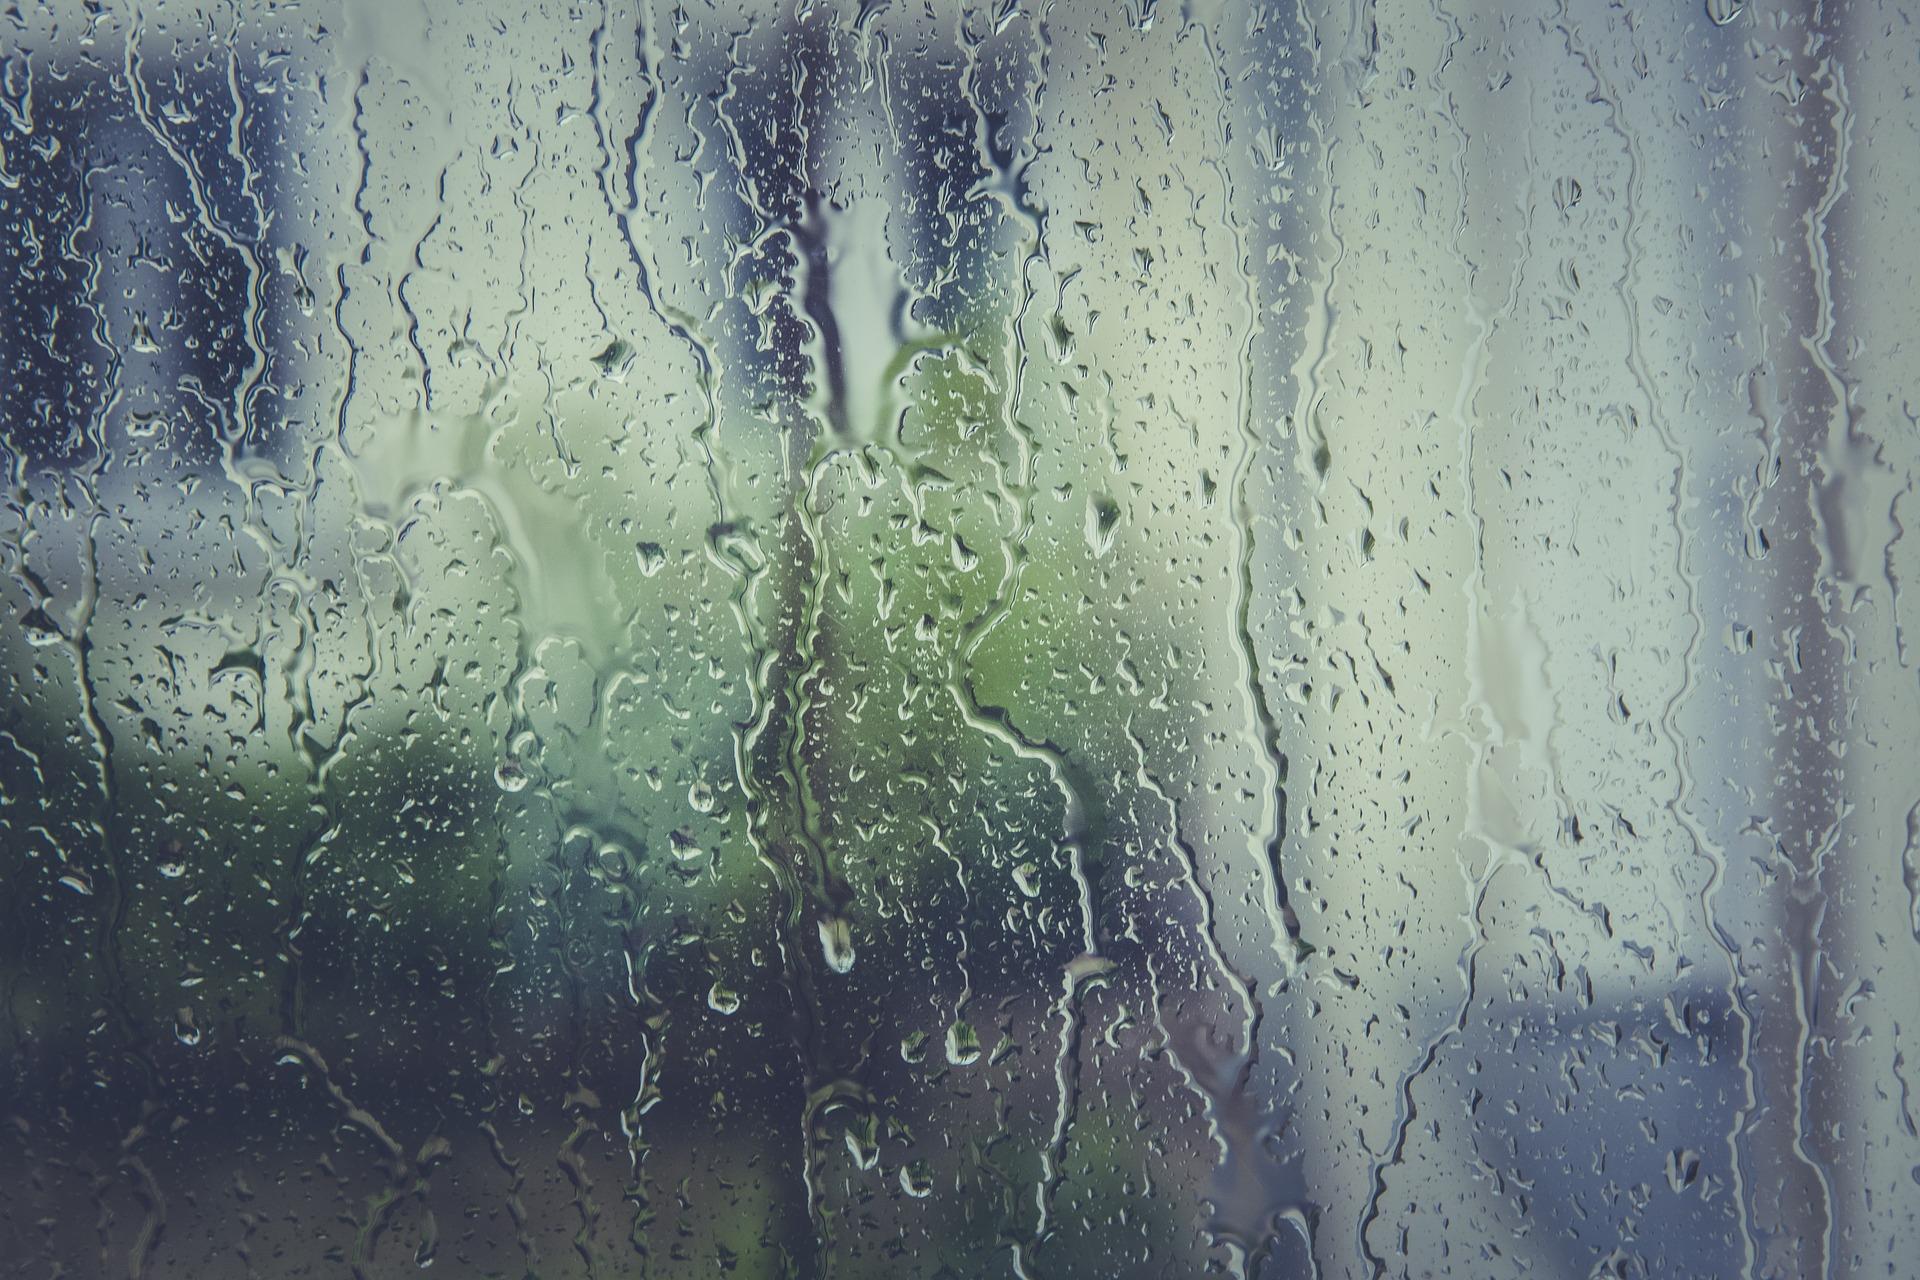 AMSS: Oprez u vožnji zbog kiše